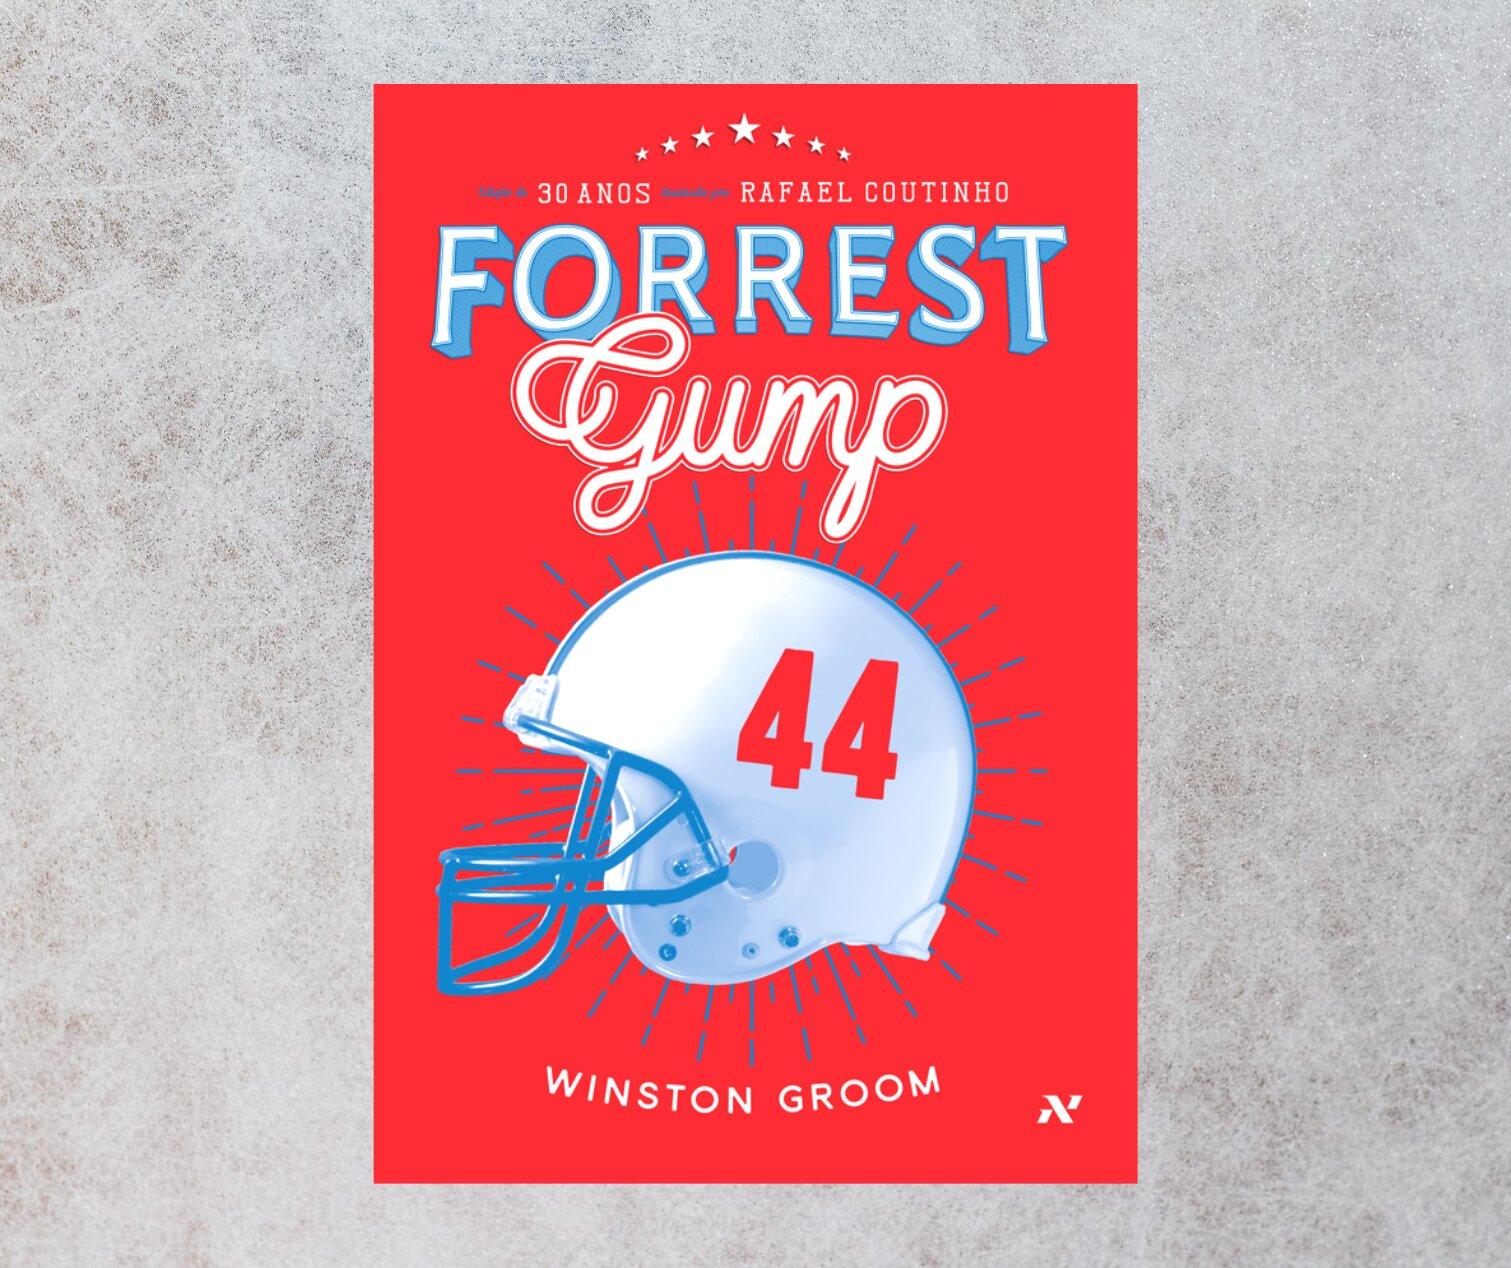 Resenha: Forrest Gump, de Winston Groom